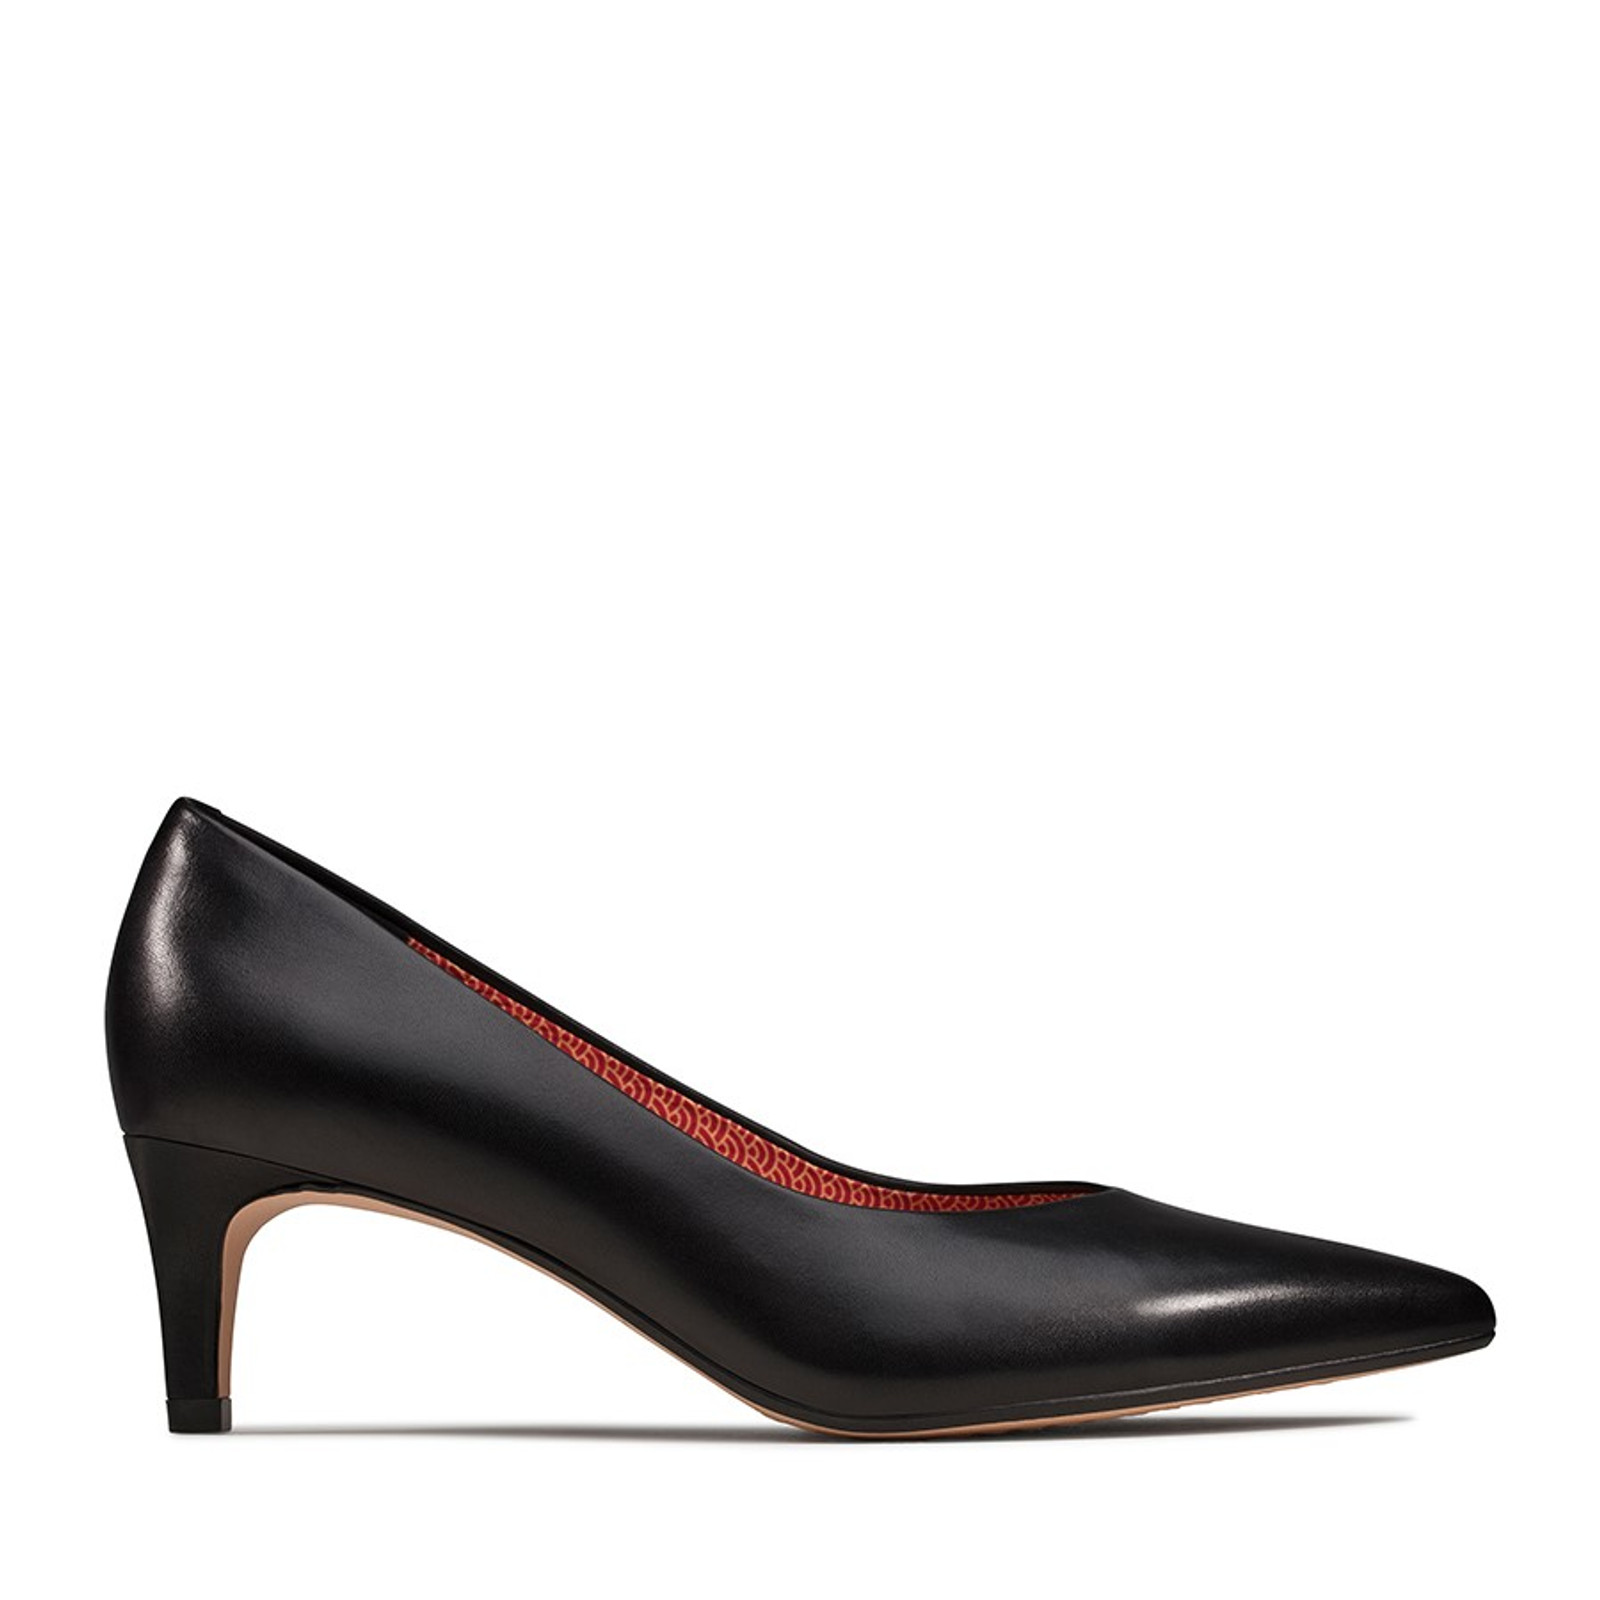 Clarks Womens LAINA55 COURT Black Interest Leather